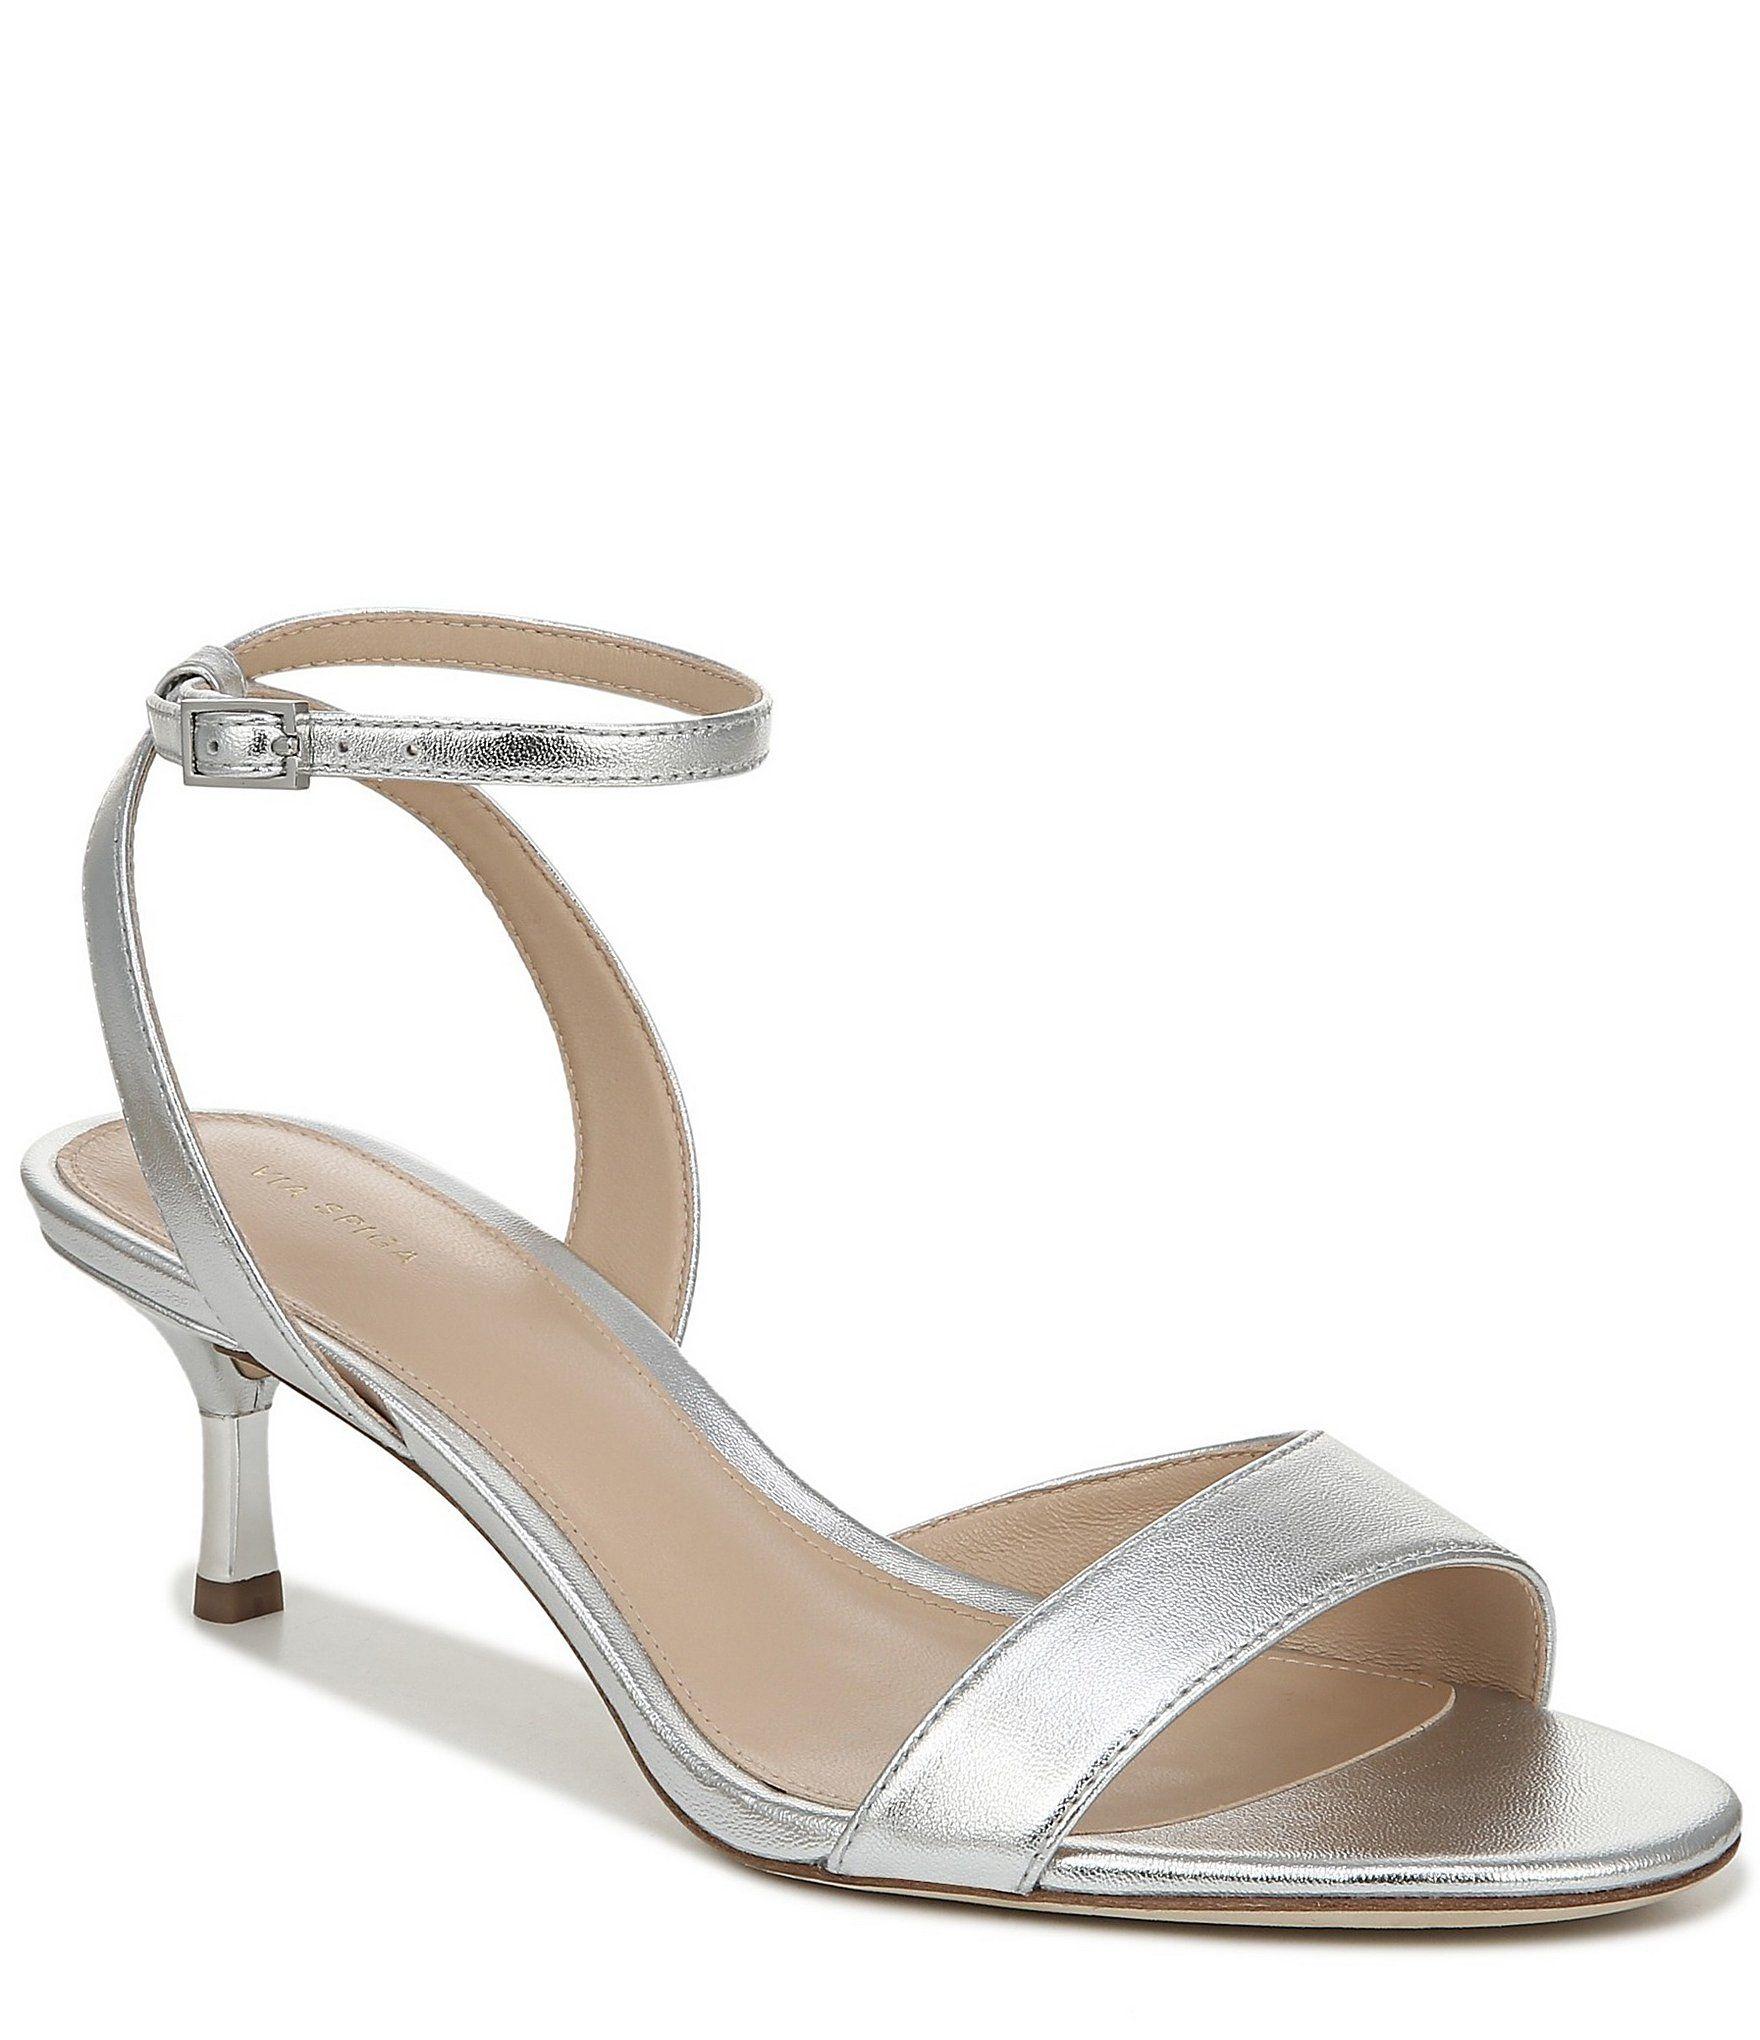 Via Spiga Louise Metal Kitten Heel Metallic Leather Dress Sandals | Dillard's